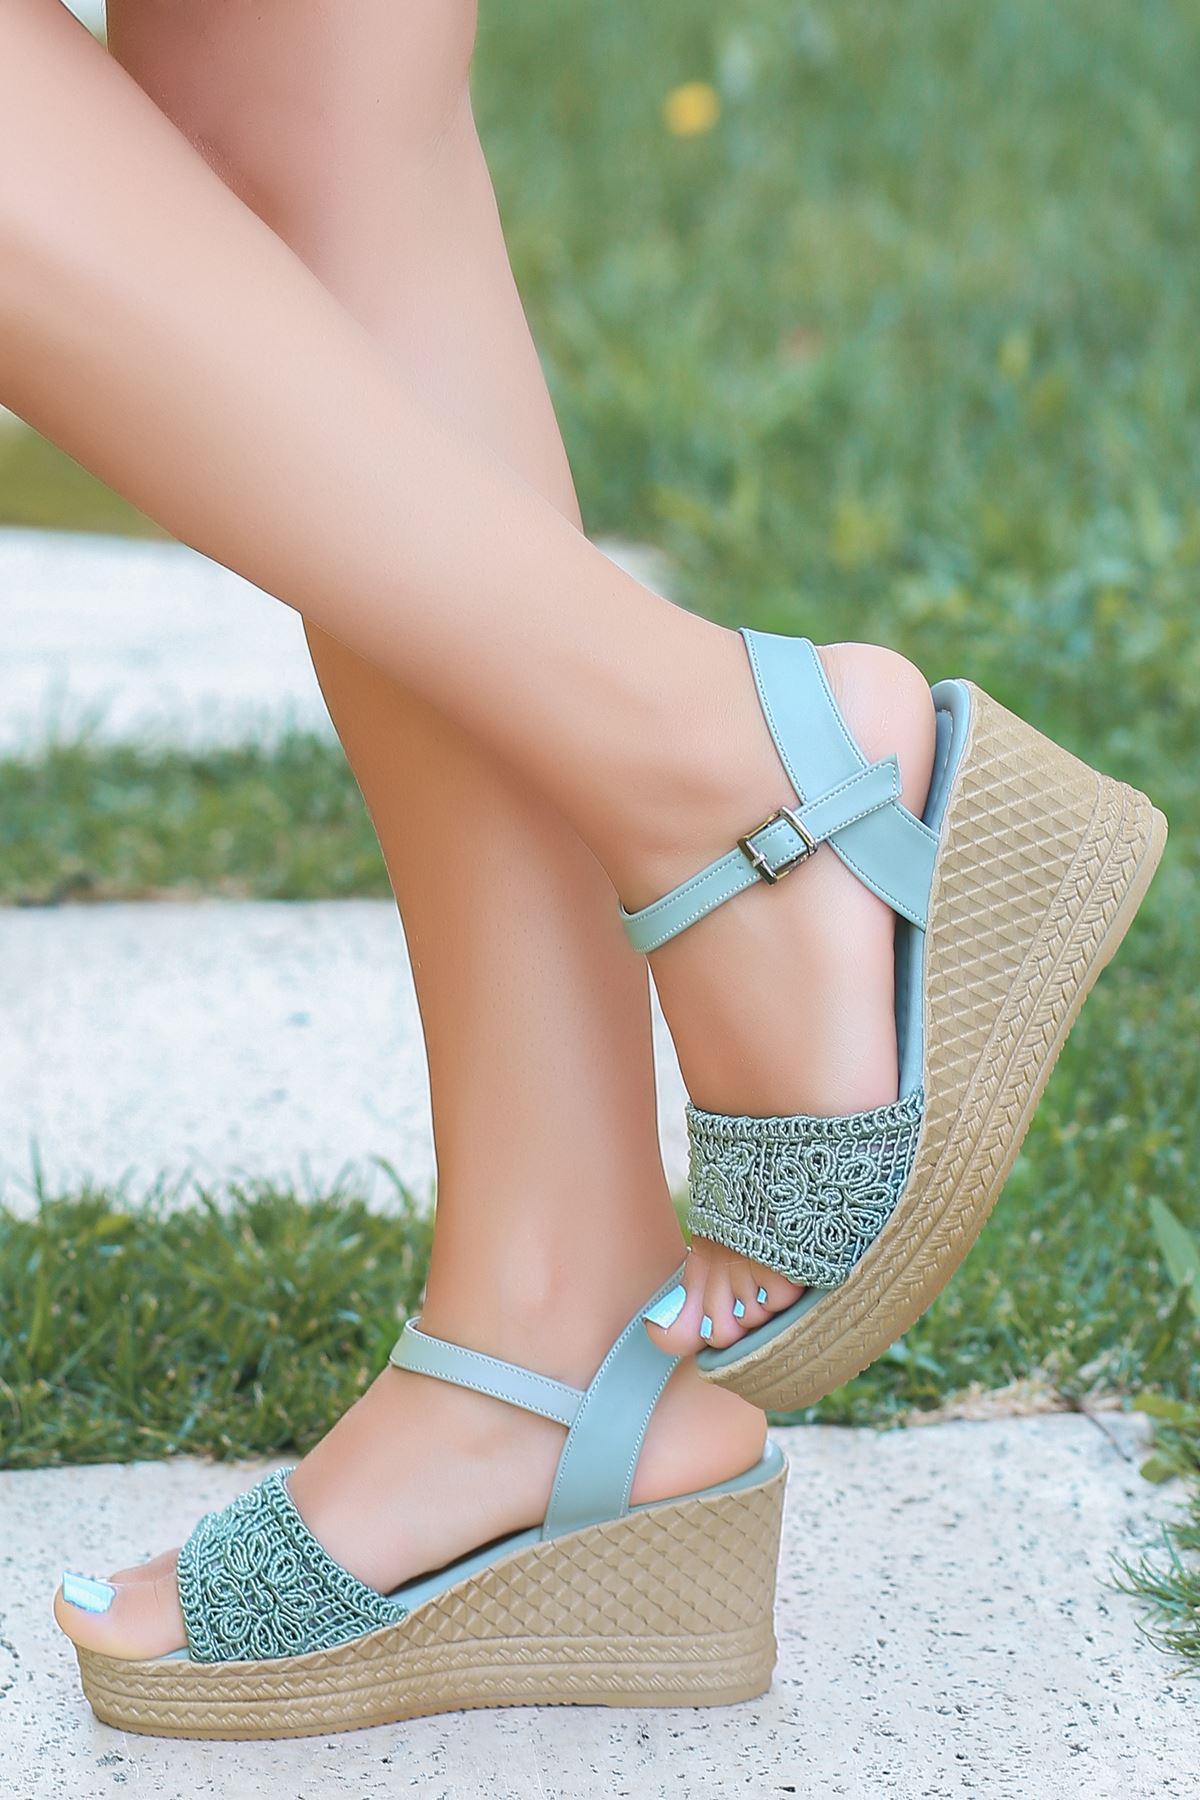 Buse Dantel Detay Dolgu Topuk Sandalet Mint Yeşili